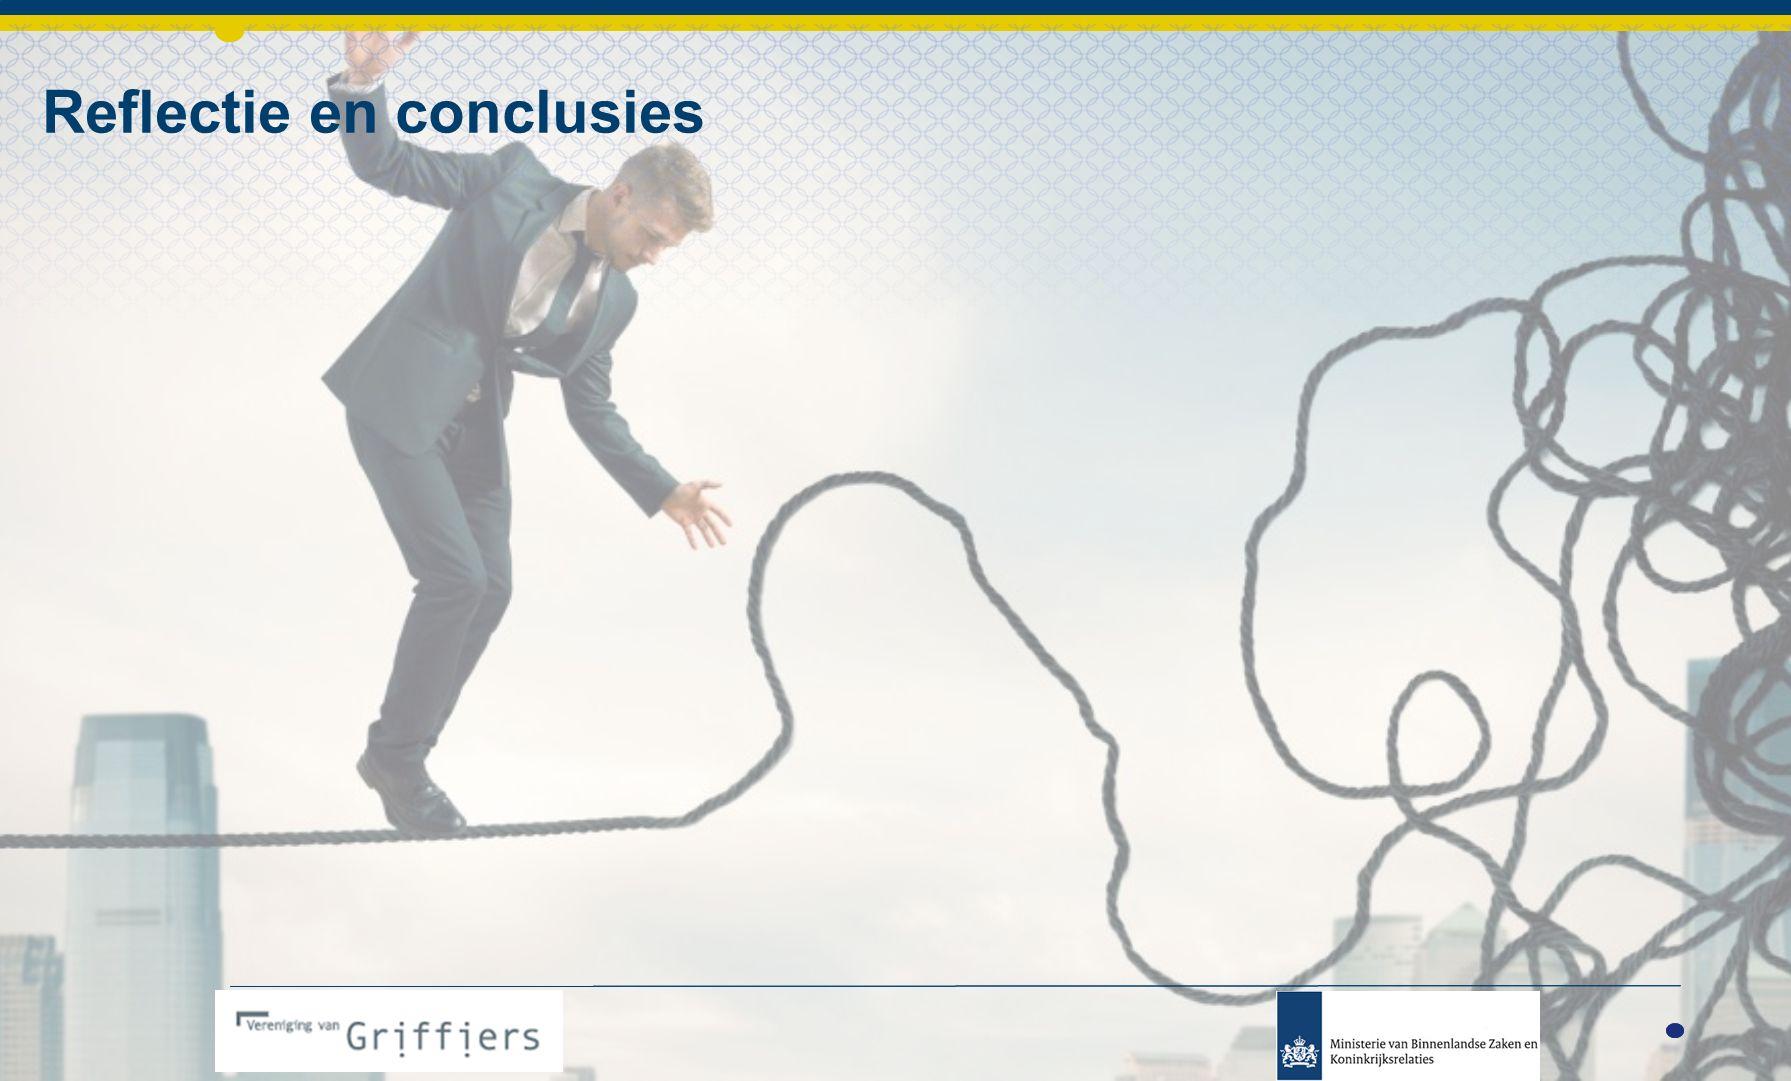 Reflectie en conclusies